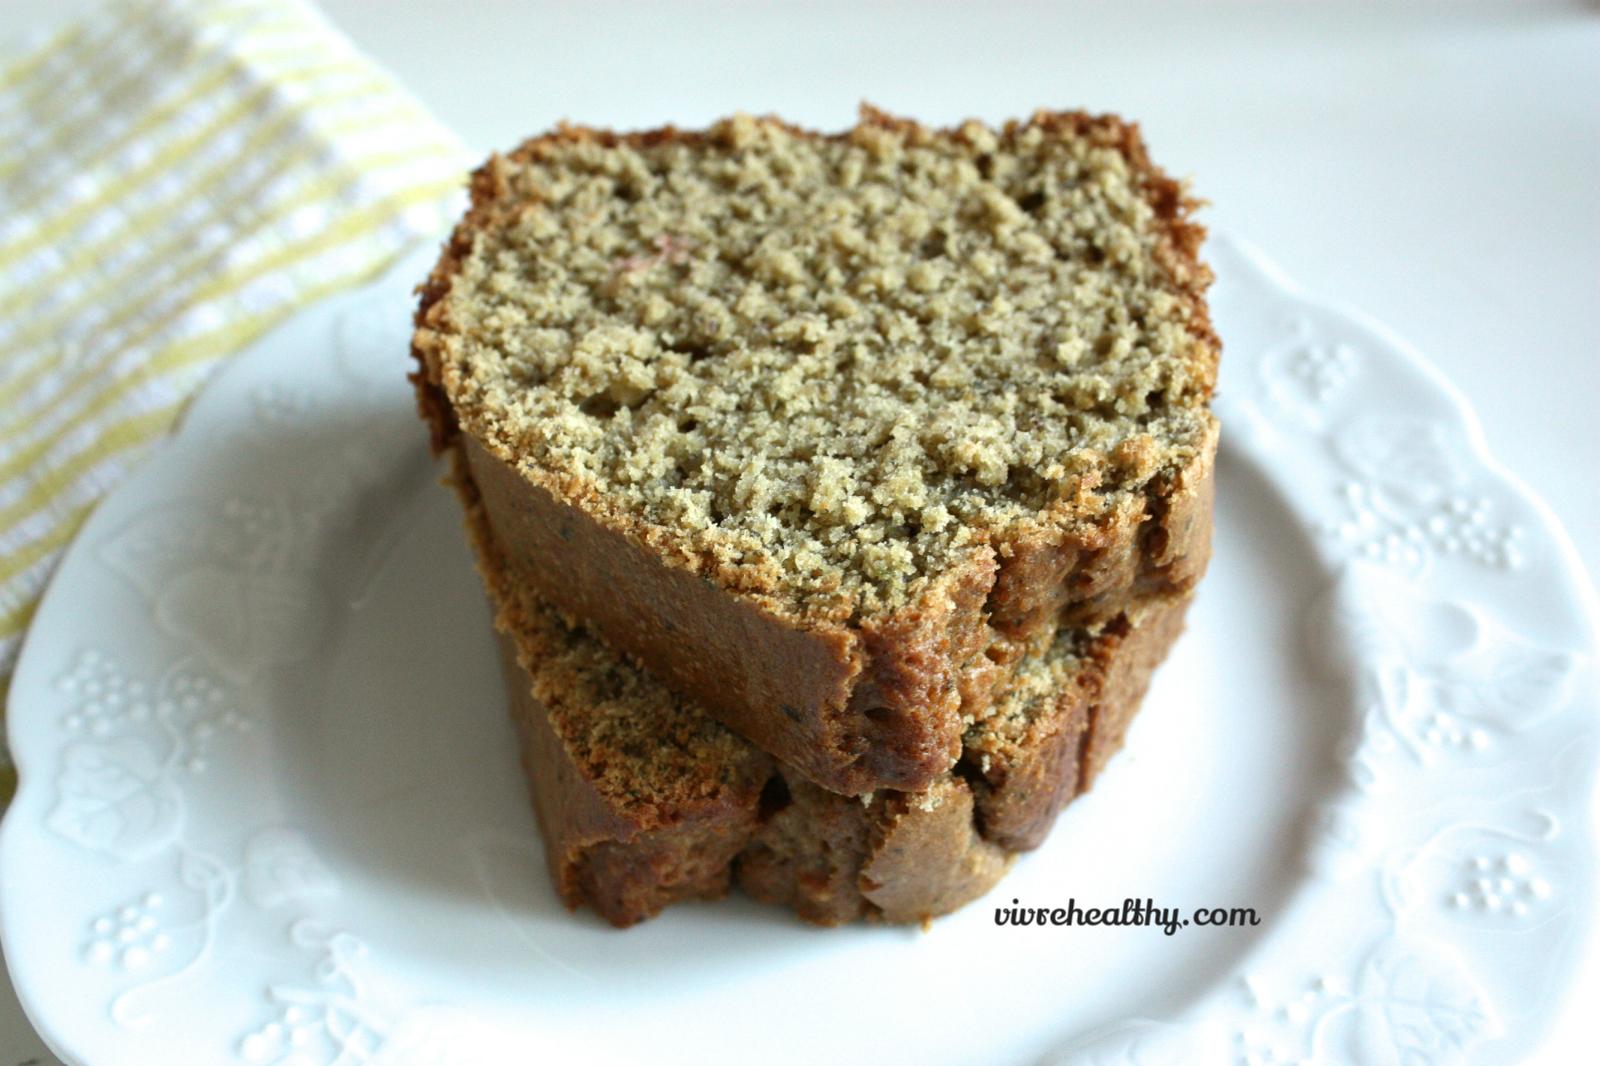 Cake au th vert vivre healthy - Gateau au chocolat healthy ...